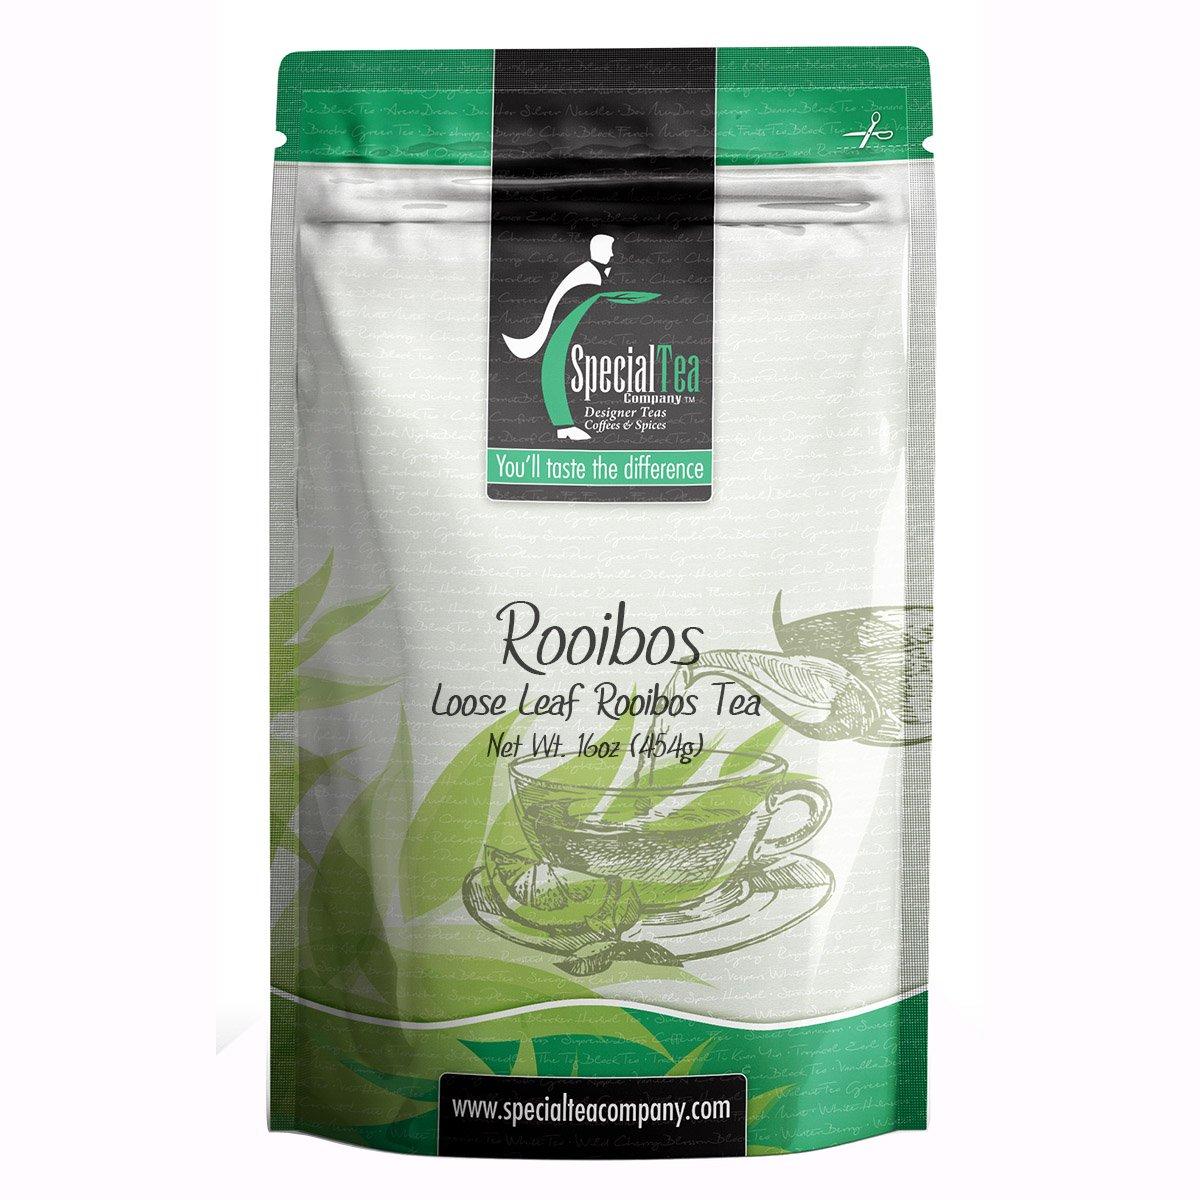 Special Tea Company Rooibos Organic Tea, Loose Leaf 16 oz. by Special Tea Company